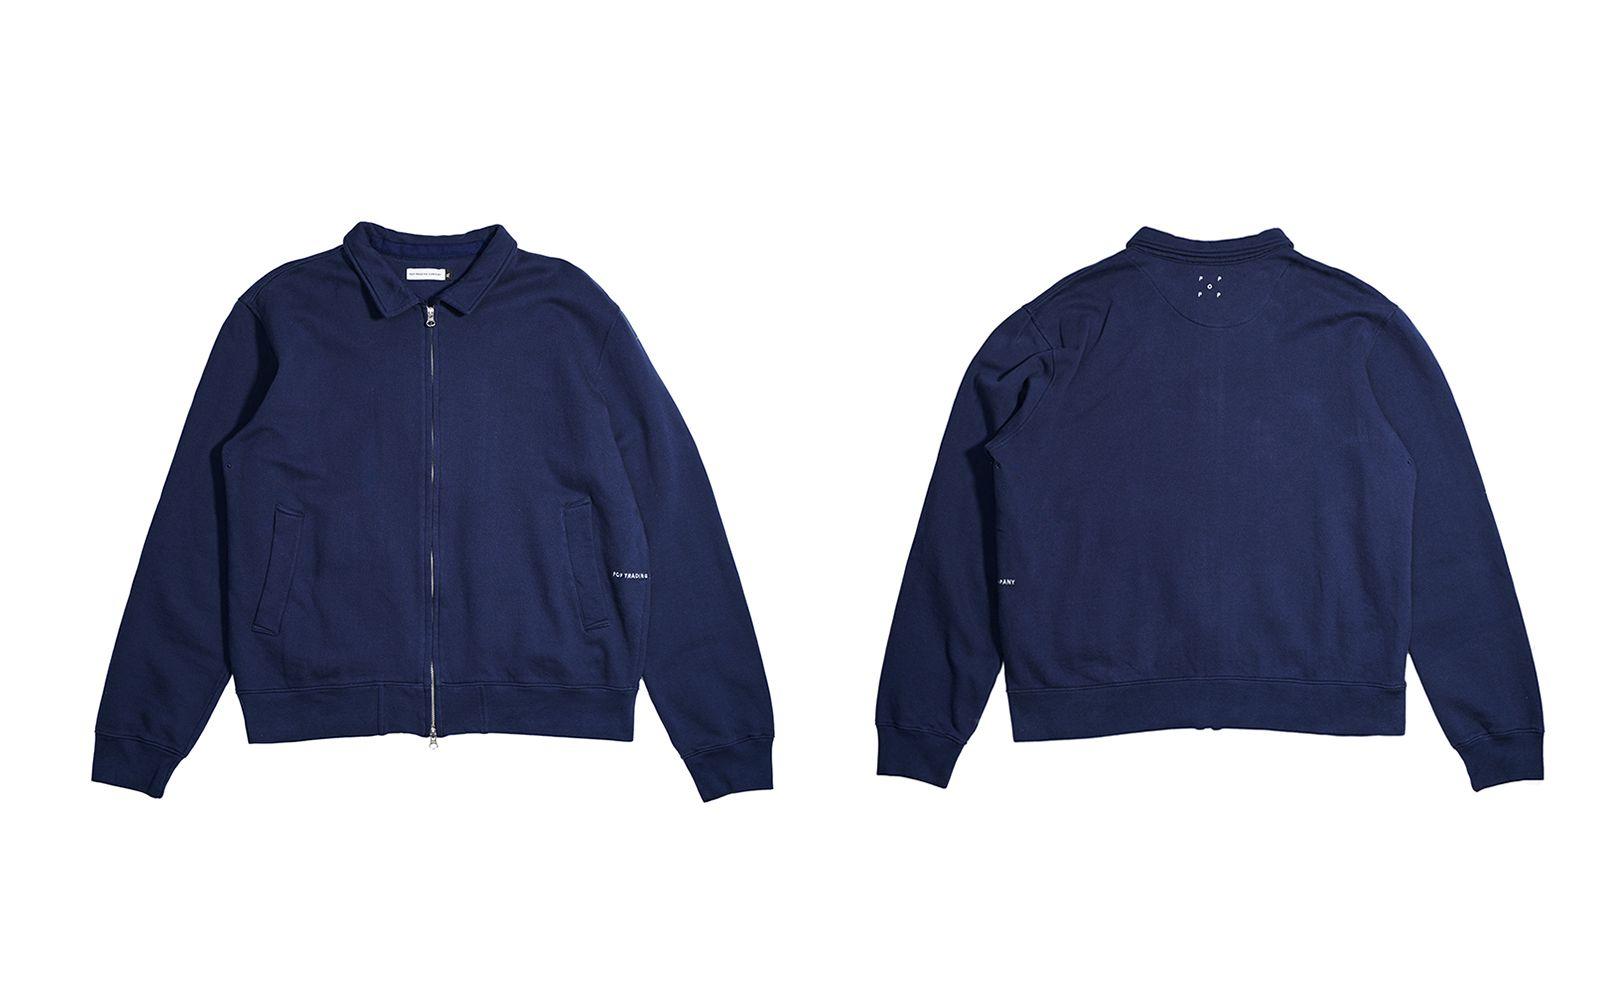 pop-trading-company-aw17-product-10-sportswear-company-fullzip-sweat-navy